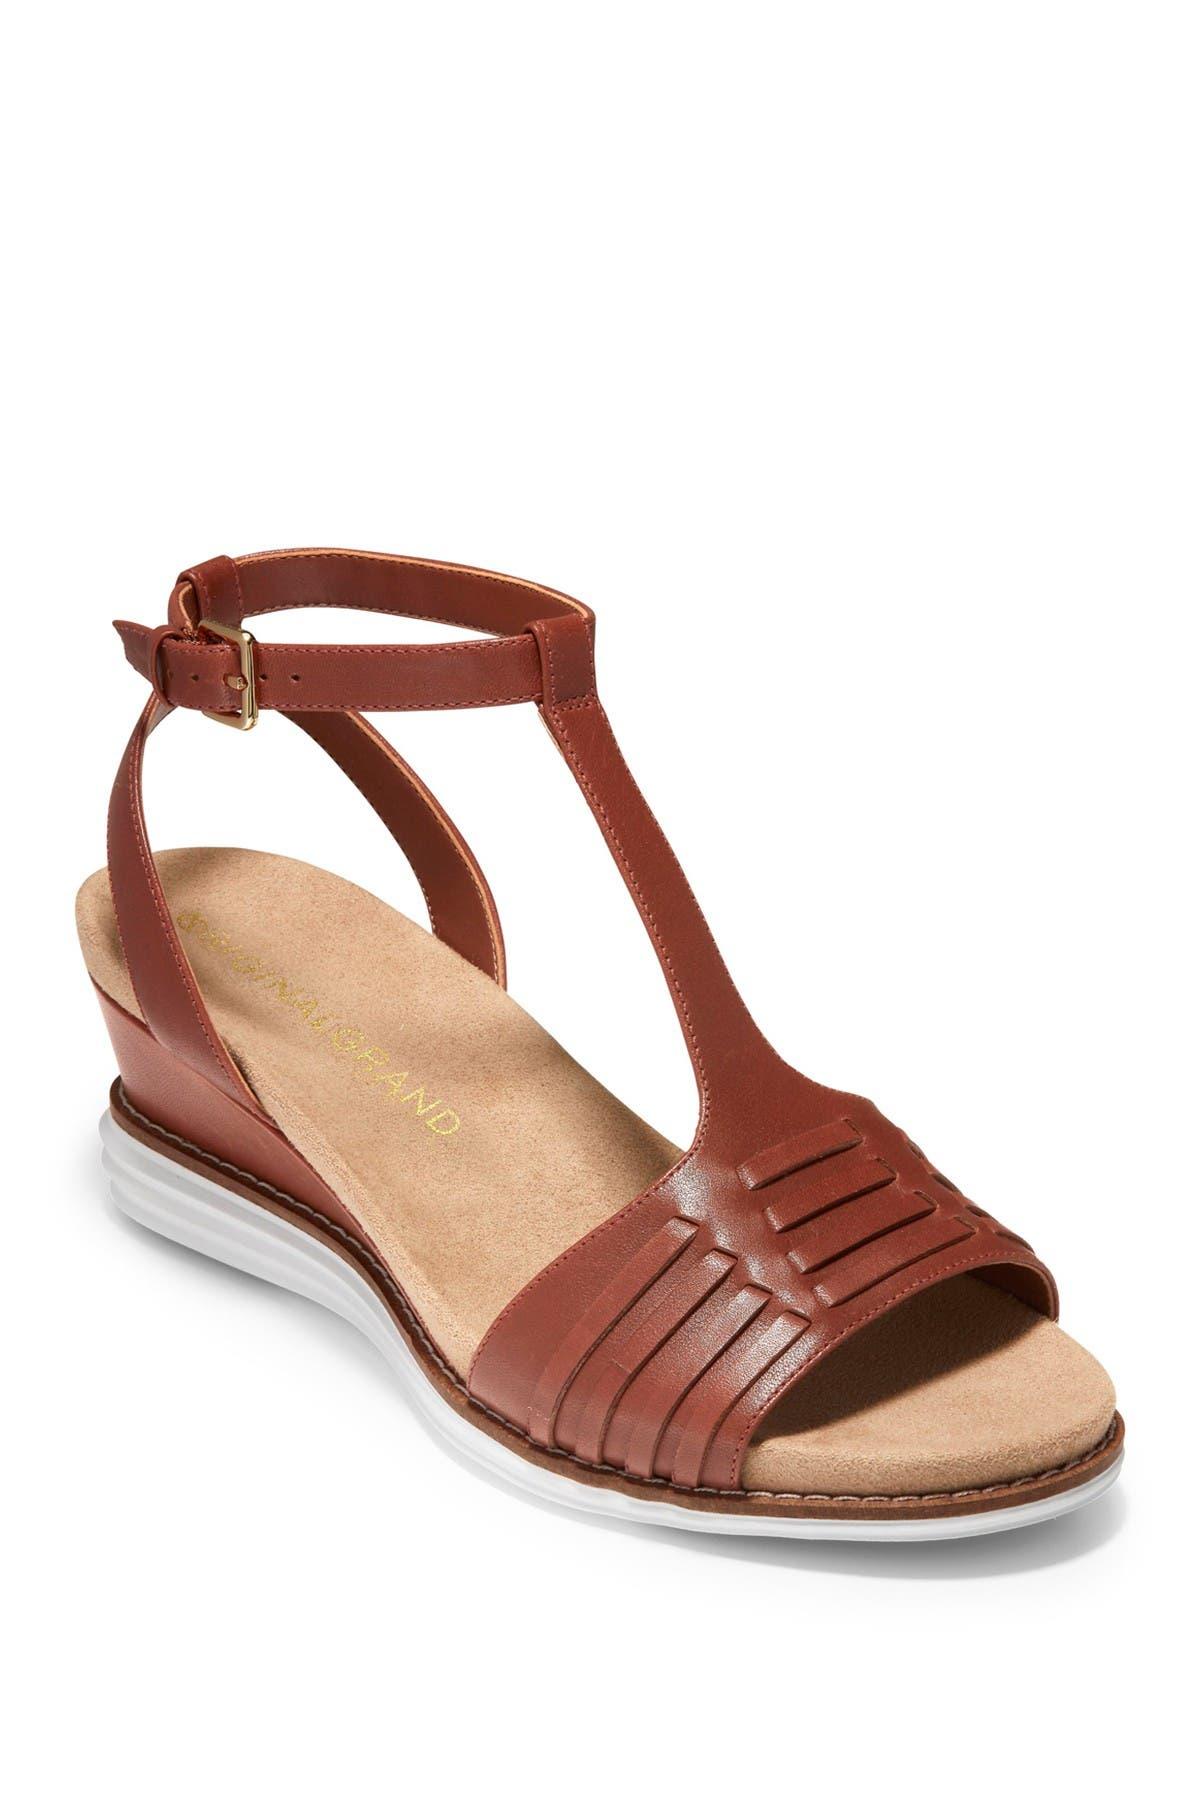 Image of Cole Haan Original T-Strap Wedge Sandal